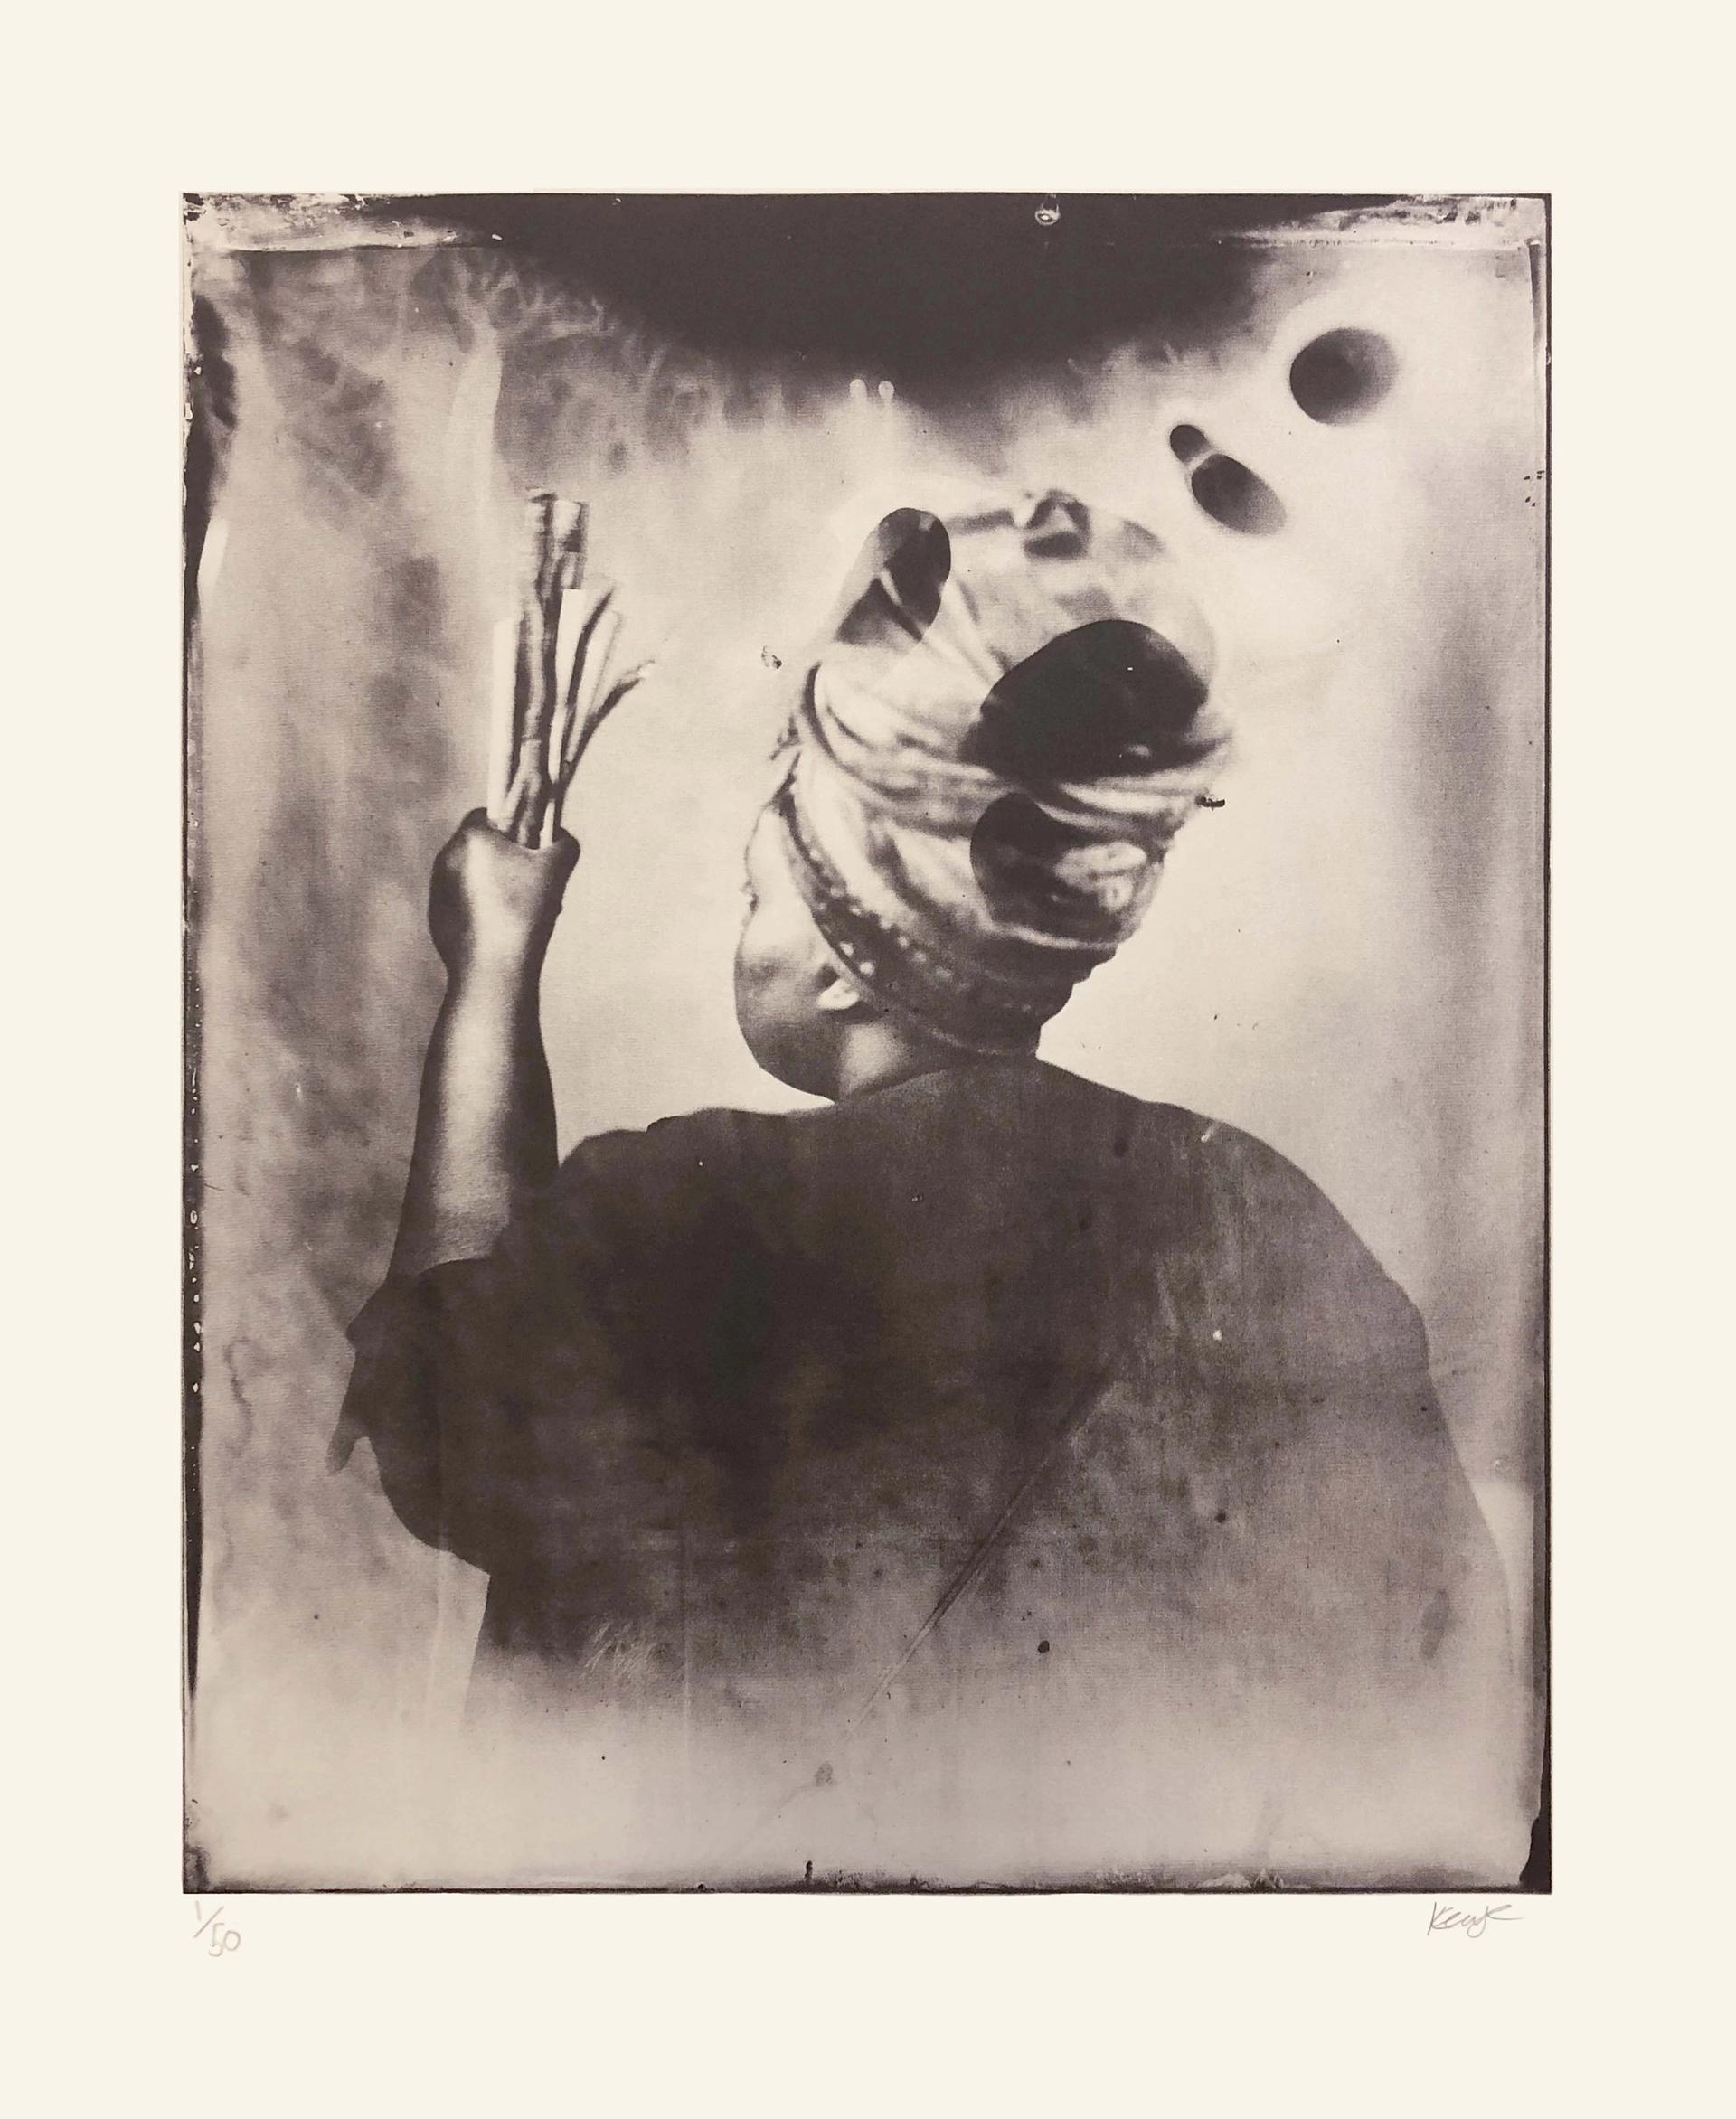 Khadija Saye's Sothiou (2017) from the series, in this space we breath (2017- 2018) © The Estate of Khadija Saye